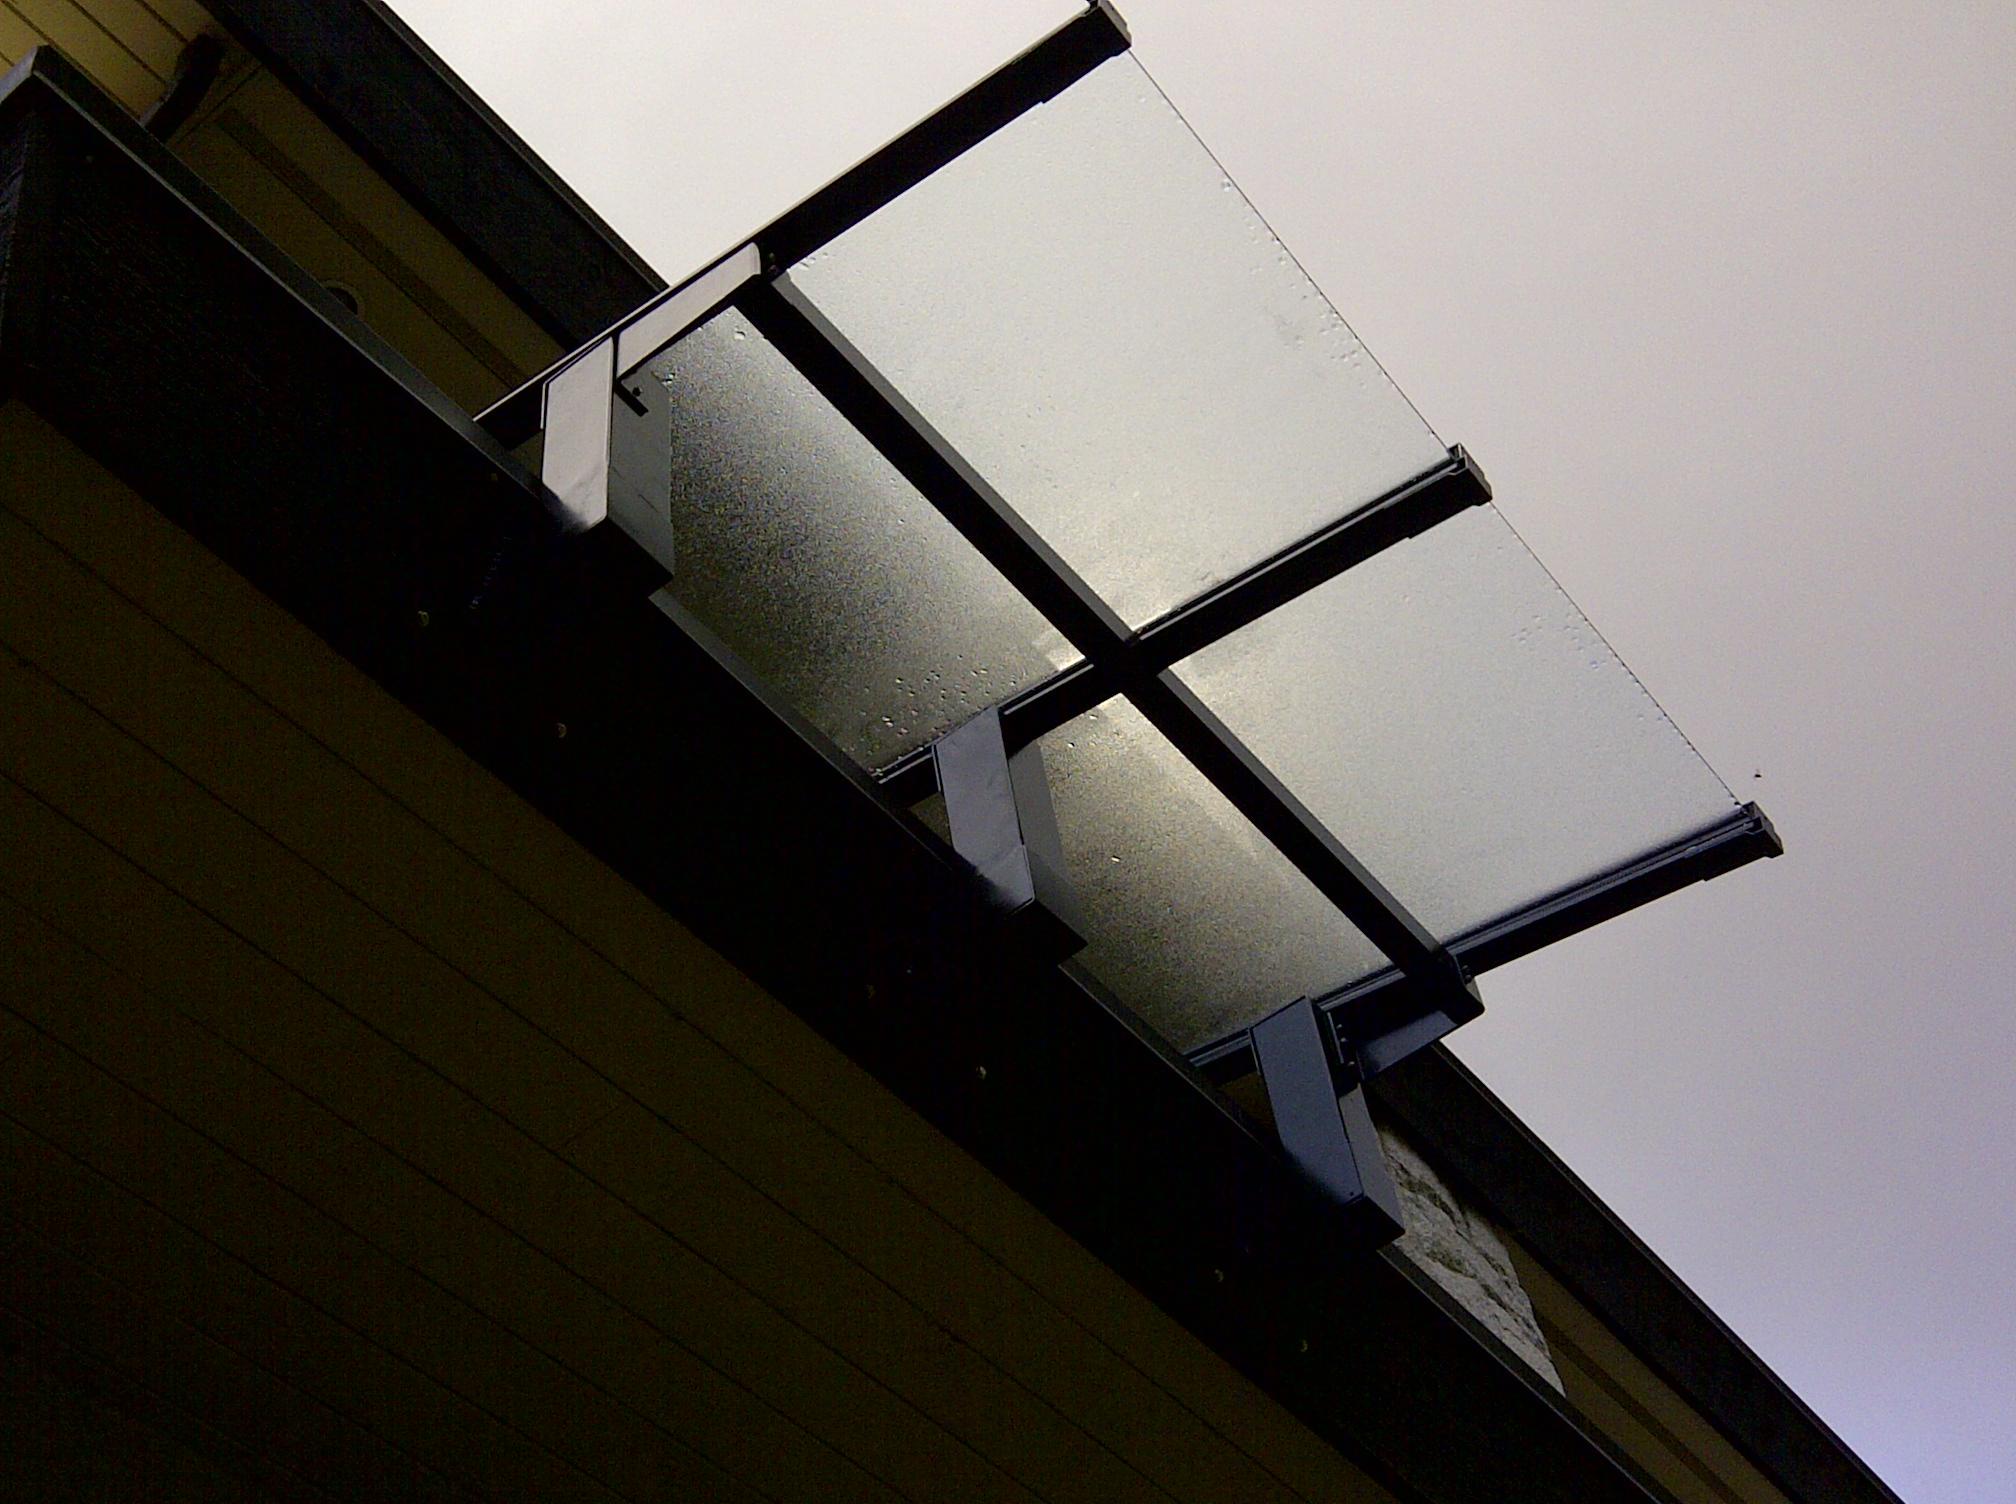 brand new aluminum canopy system